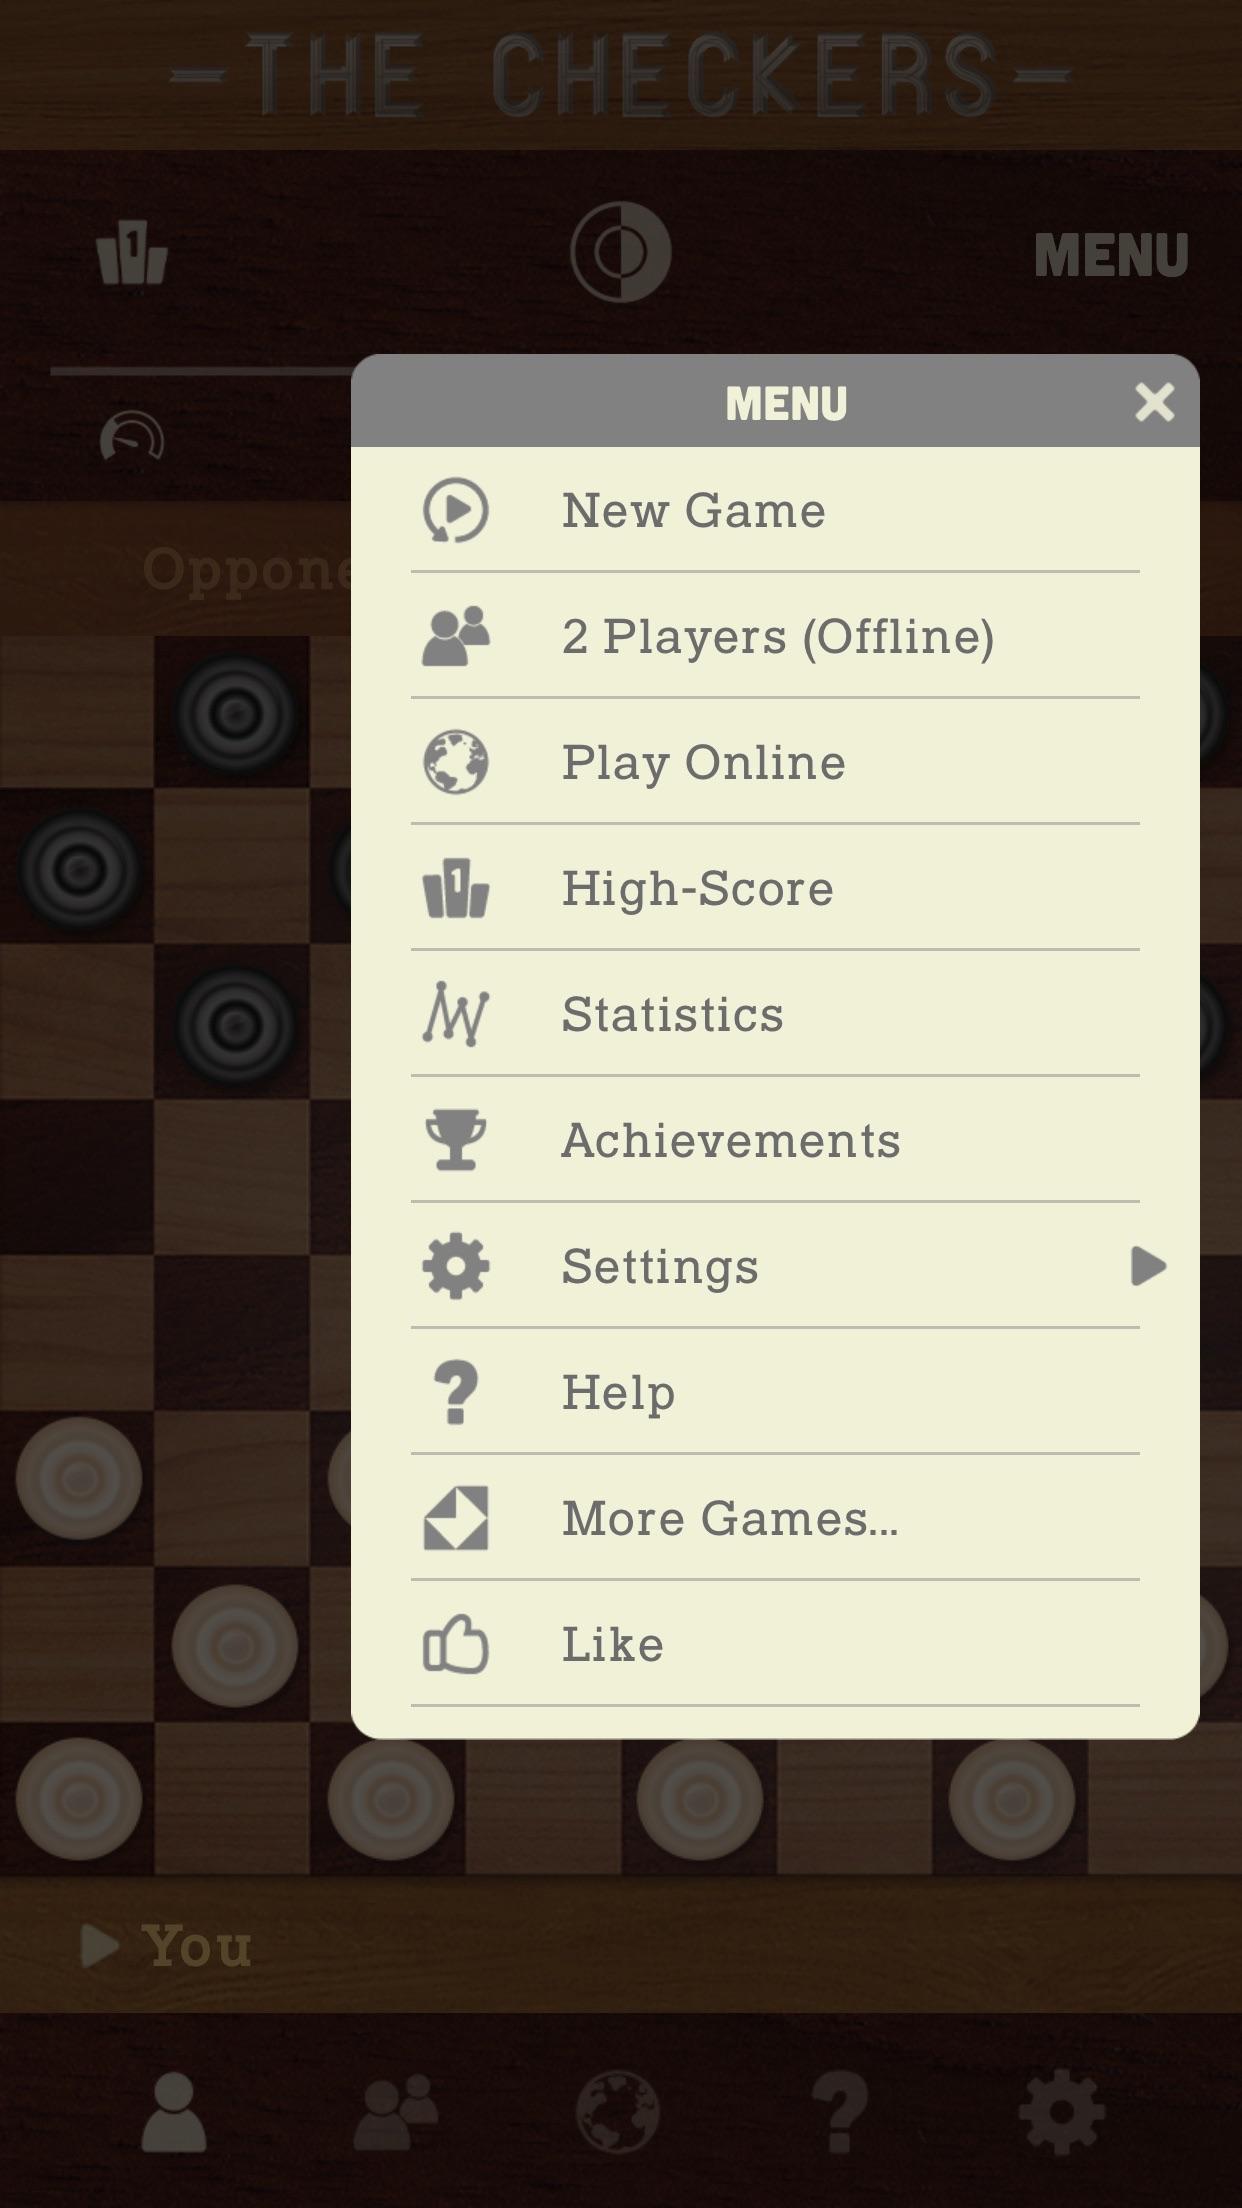 The Checkers - Classic Board Games Screenshot